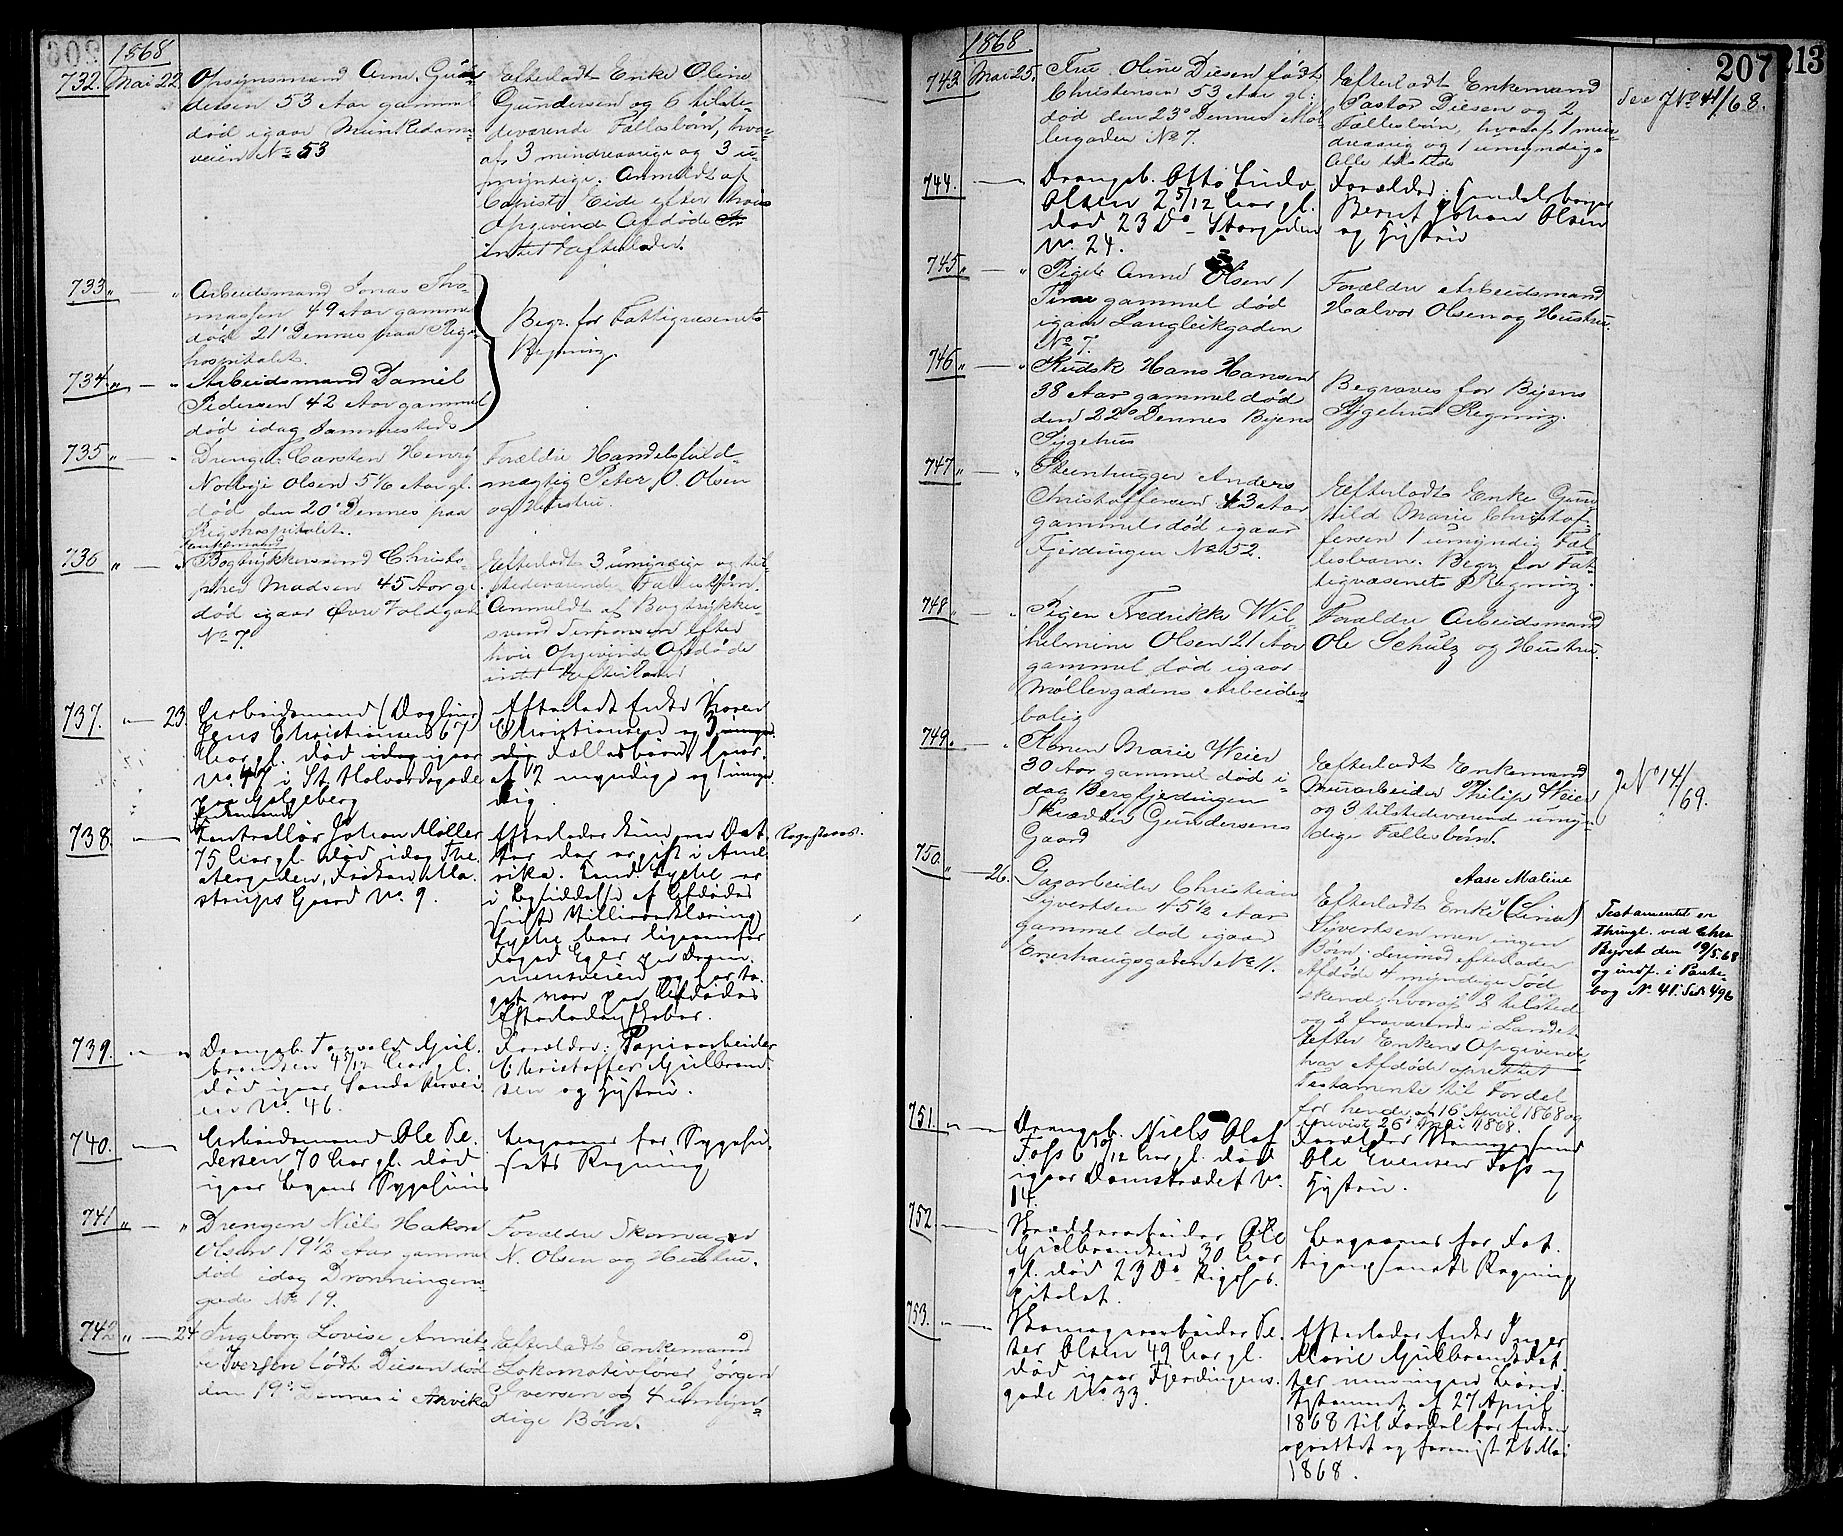 SAO, Oslo skifterett, G/Ga/Gaa/L0007: Dødsfallsprotokoll, 1864-1870, p. 206b-207a